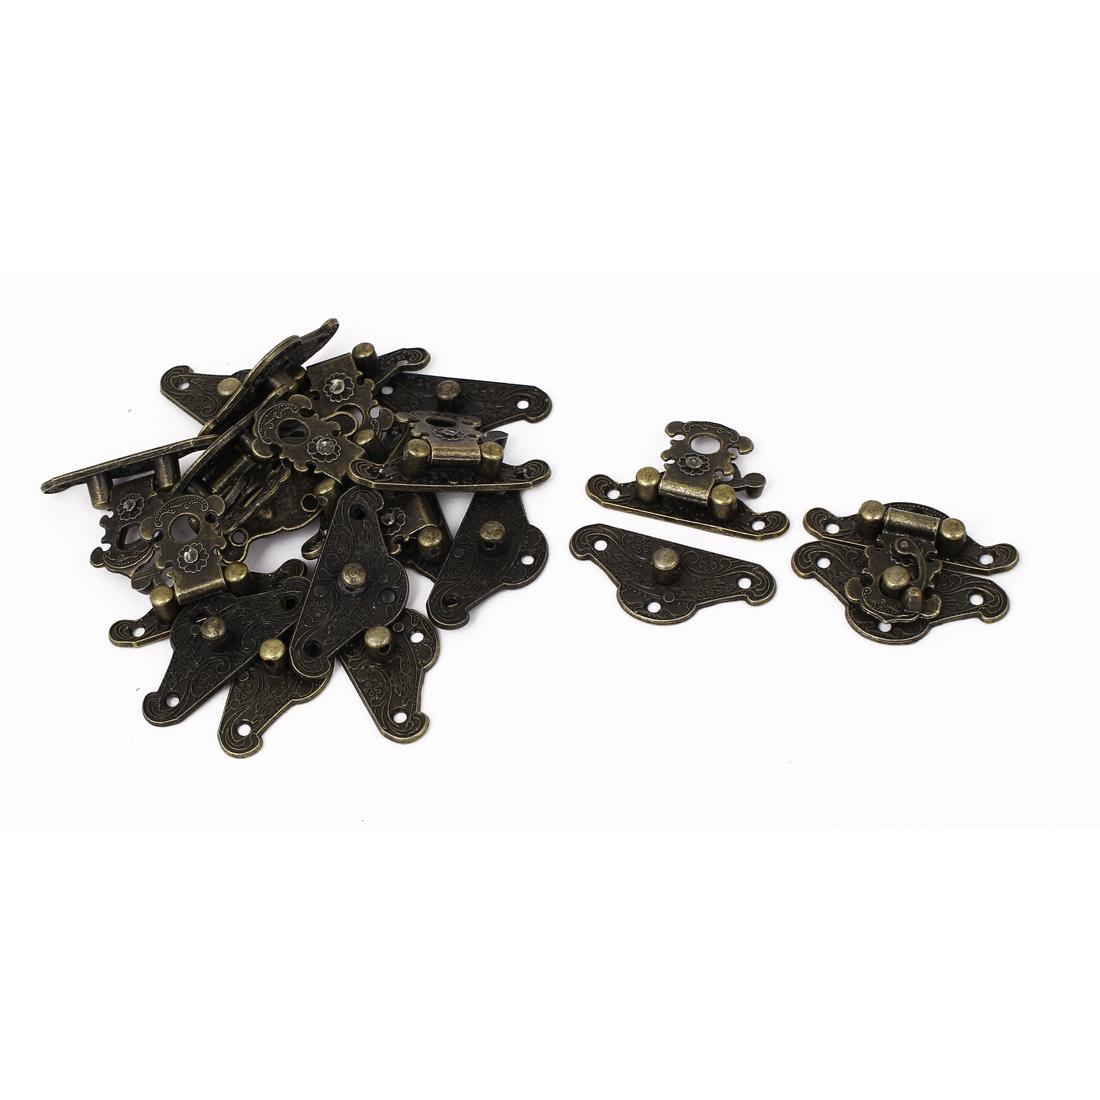 38mm x 29mm Vintage Style Wooden Box Case Hook Lock Lid Latch Bronze Tone 10pcs